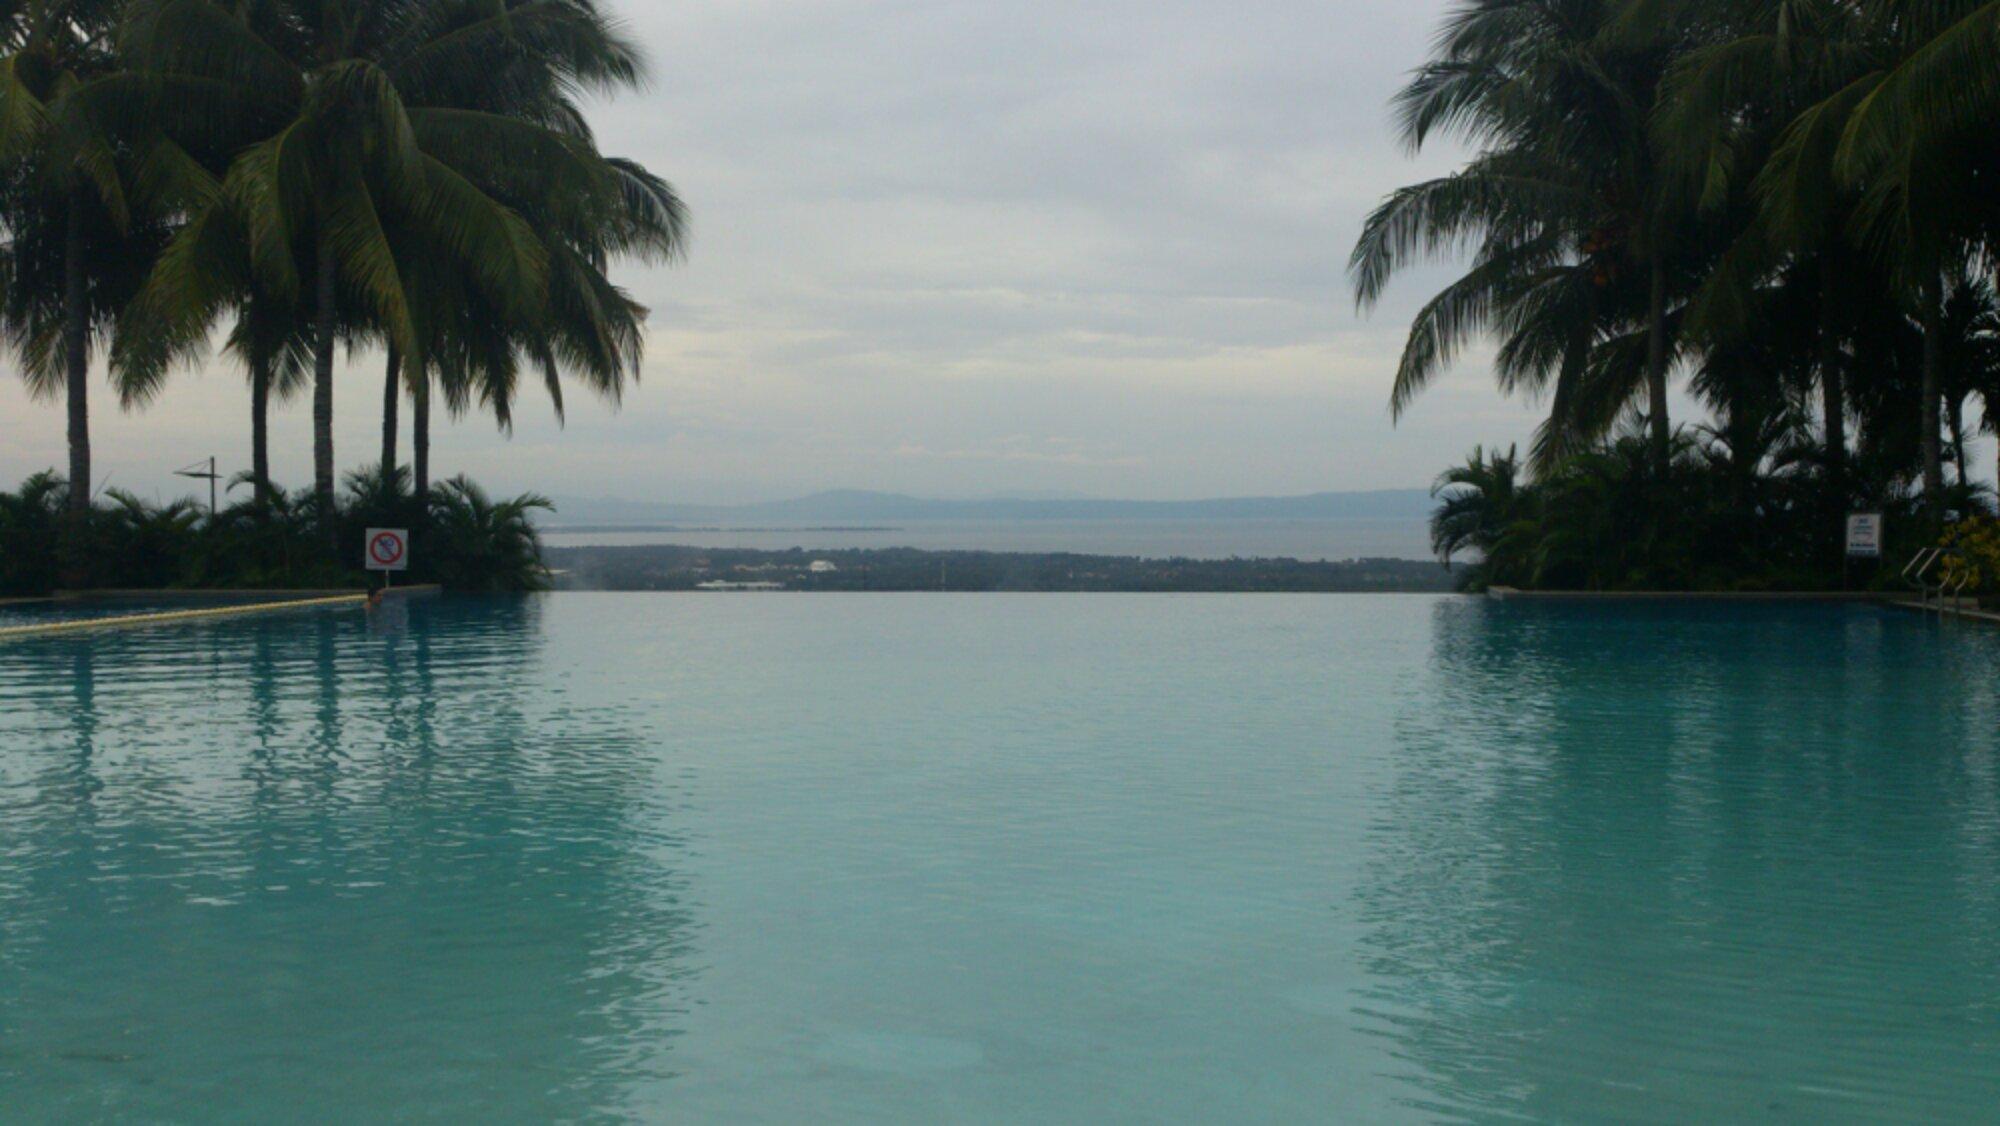 toril resorts davao resorts infinity pool christine writes villa de mercedes infinity pool davao